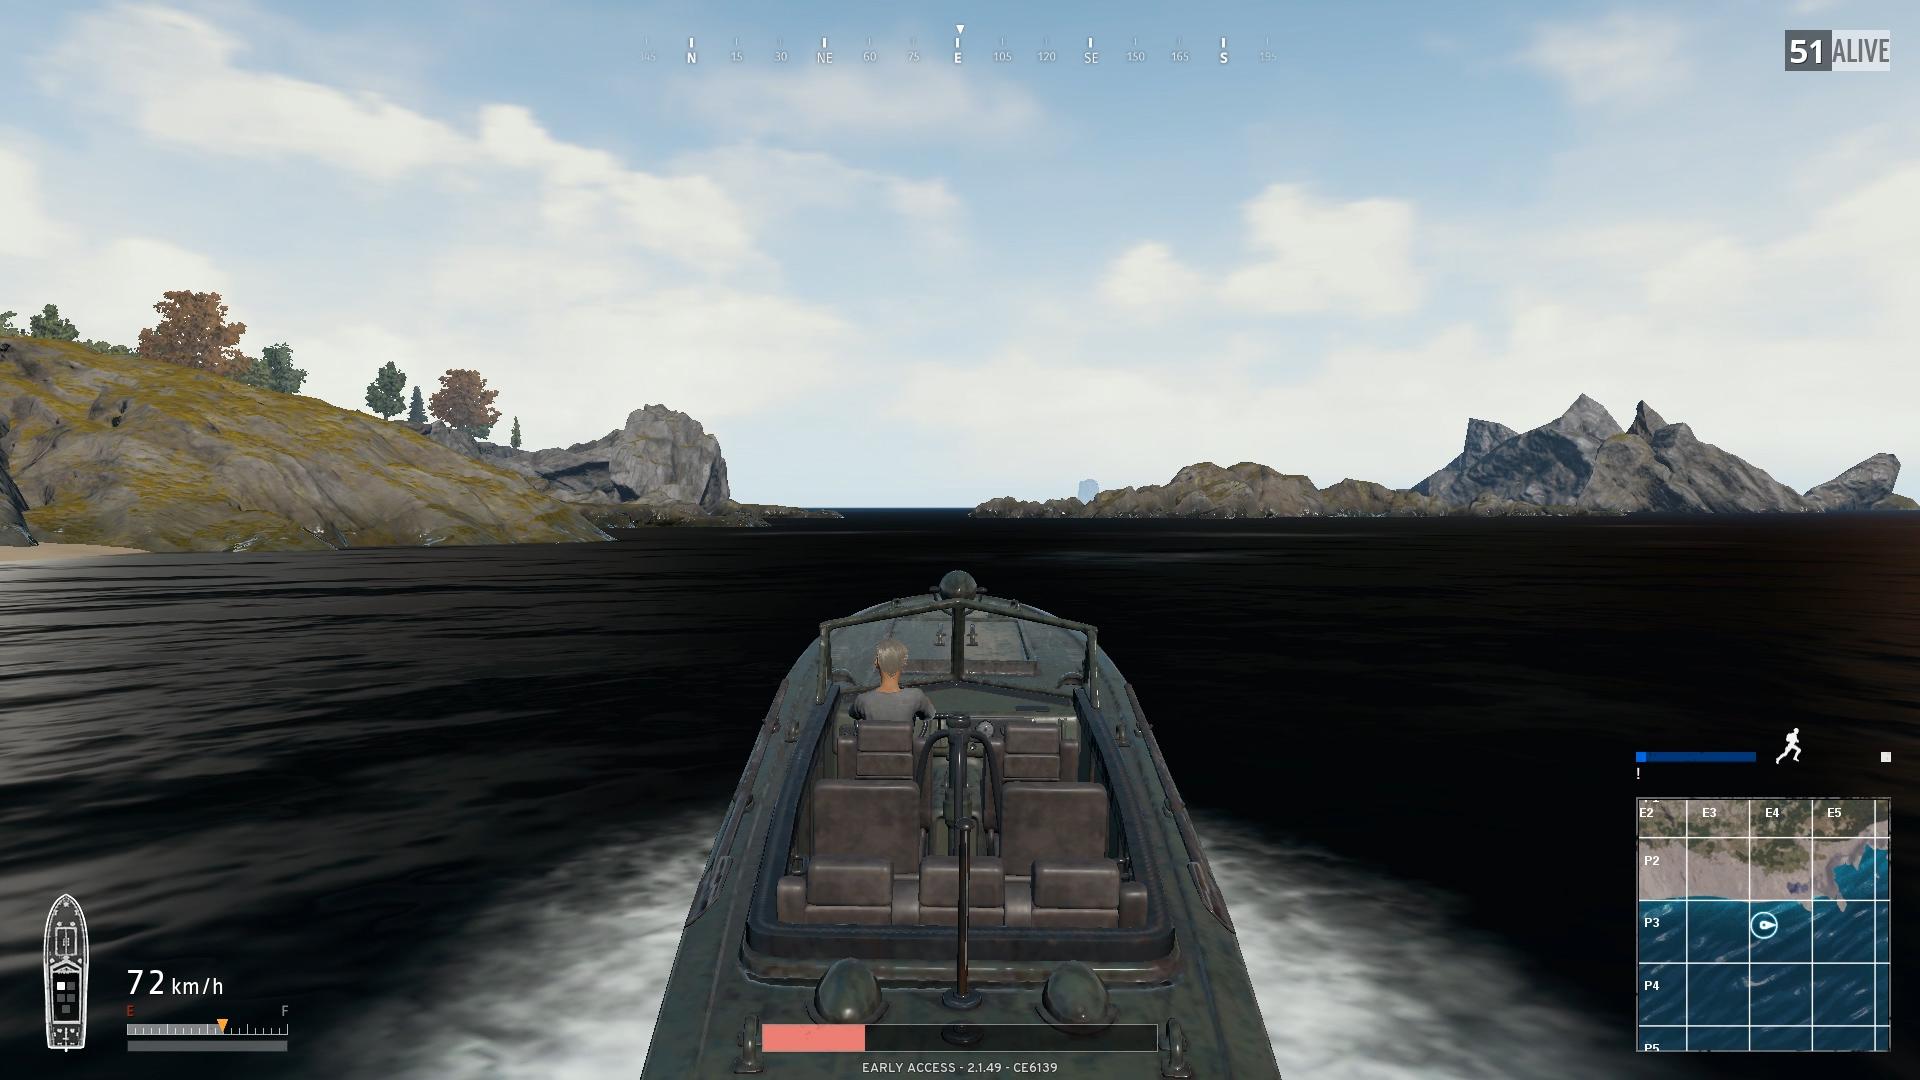 Playerunknown S Battlegrounds Car Spawns: All Boat Spawn Locations In PlayerUnknown's Battlegrounds